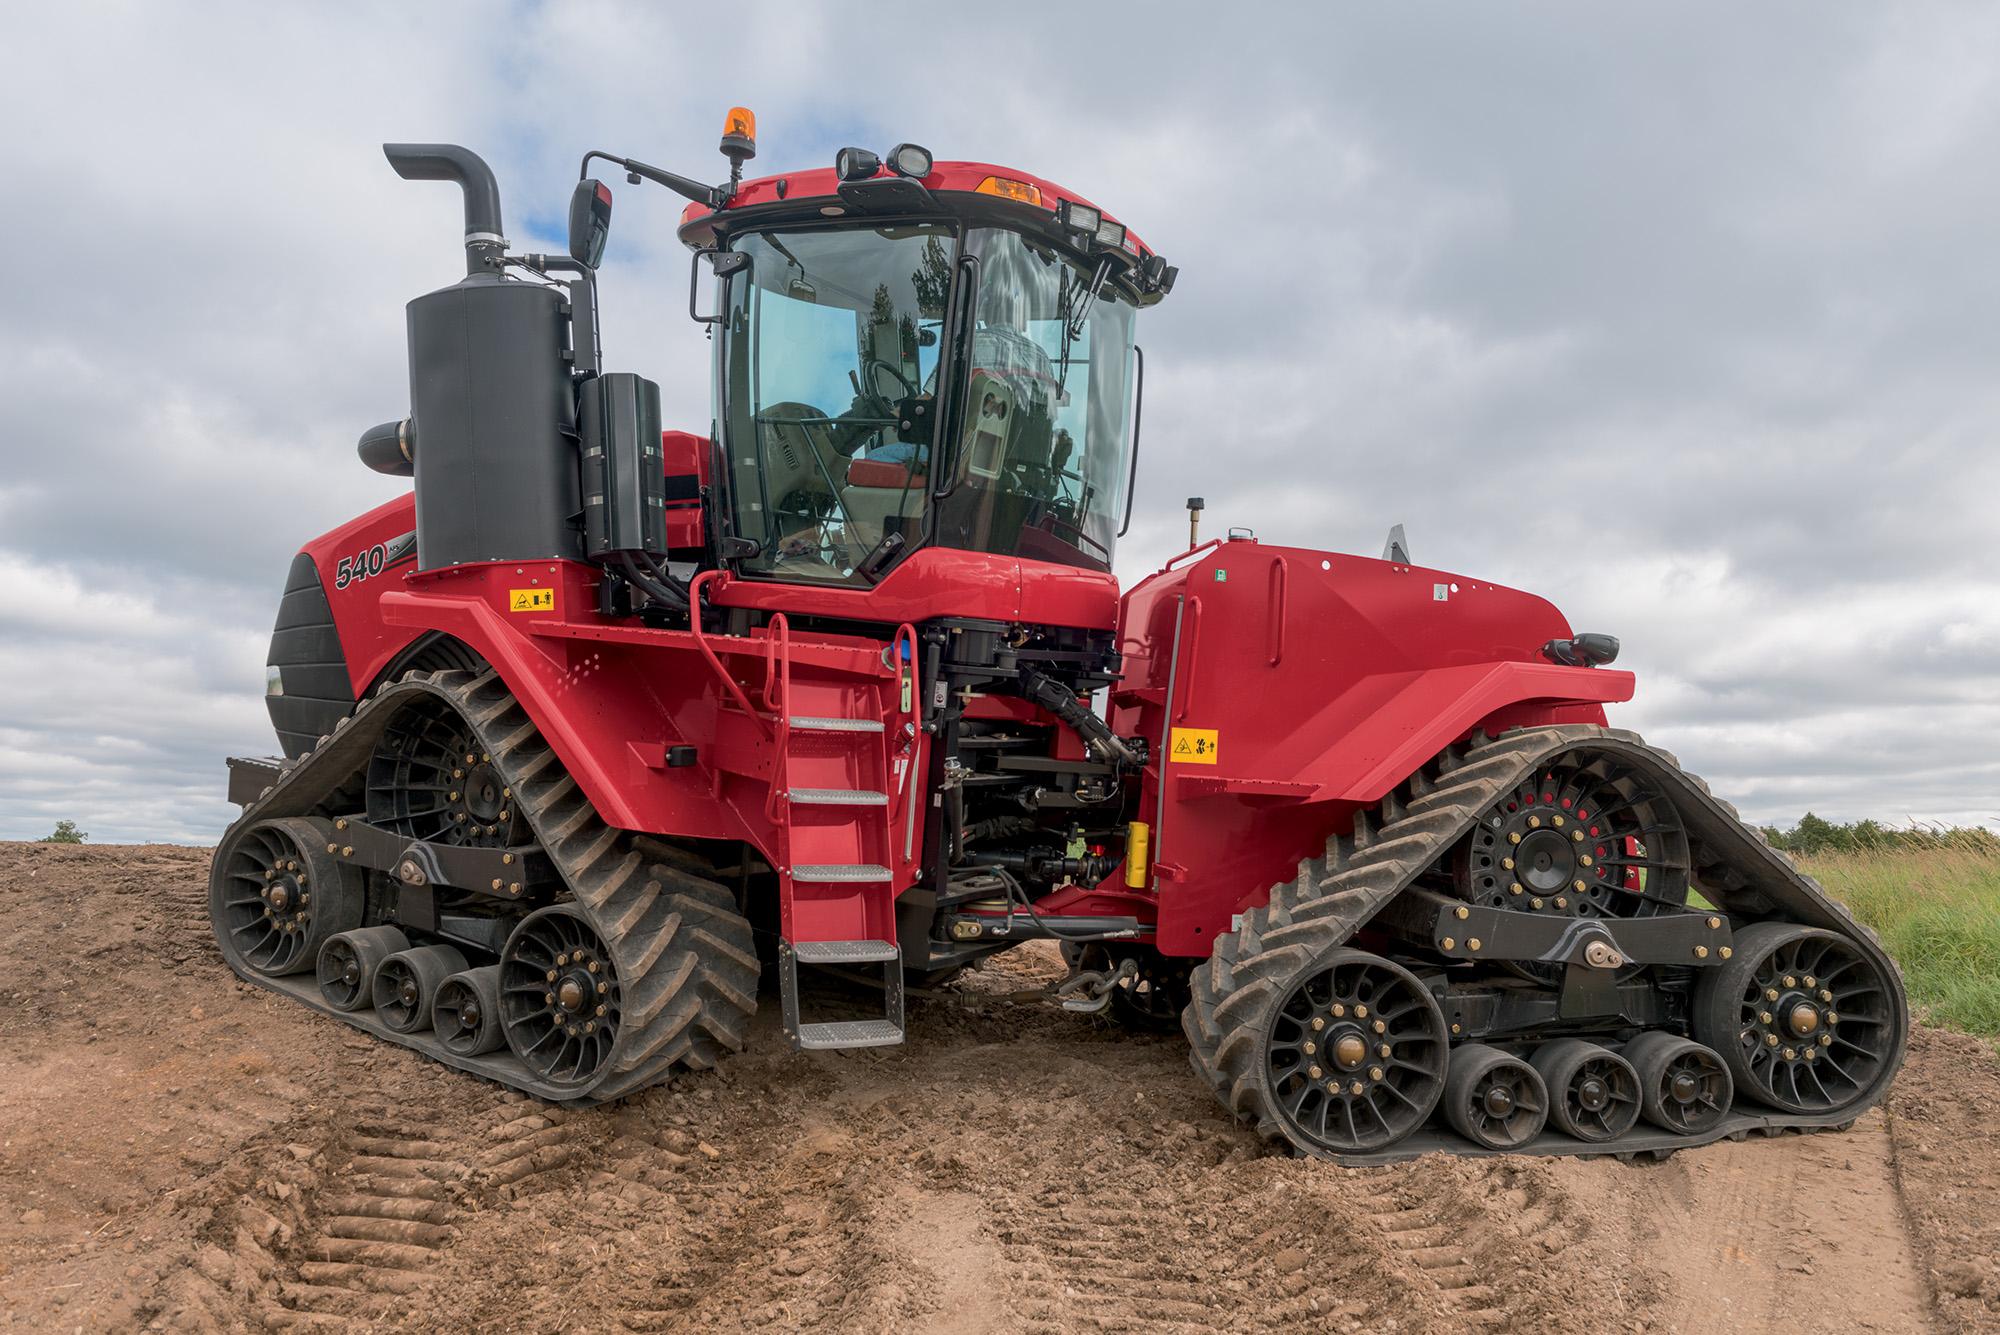 Steiger_Quadtrac_540_0713_MIM 0790?width=410&height=265 steiger series 4wd row crop farming tractors case ih  at gsmx.co